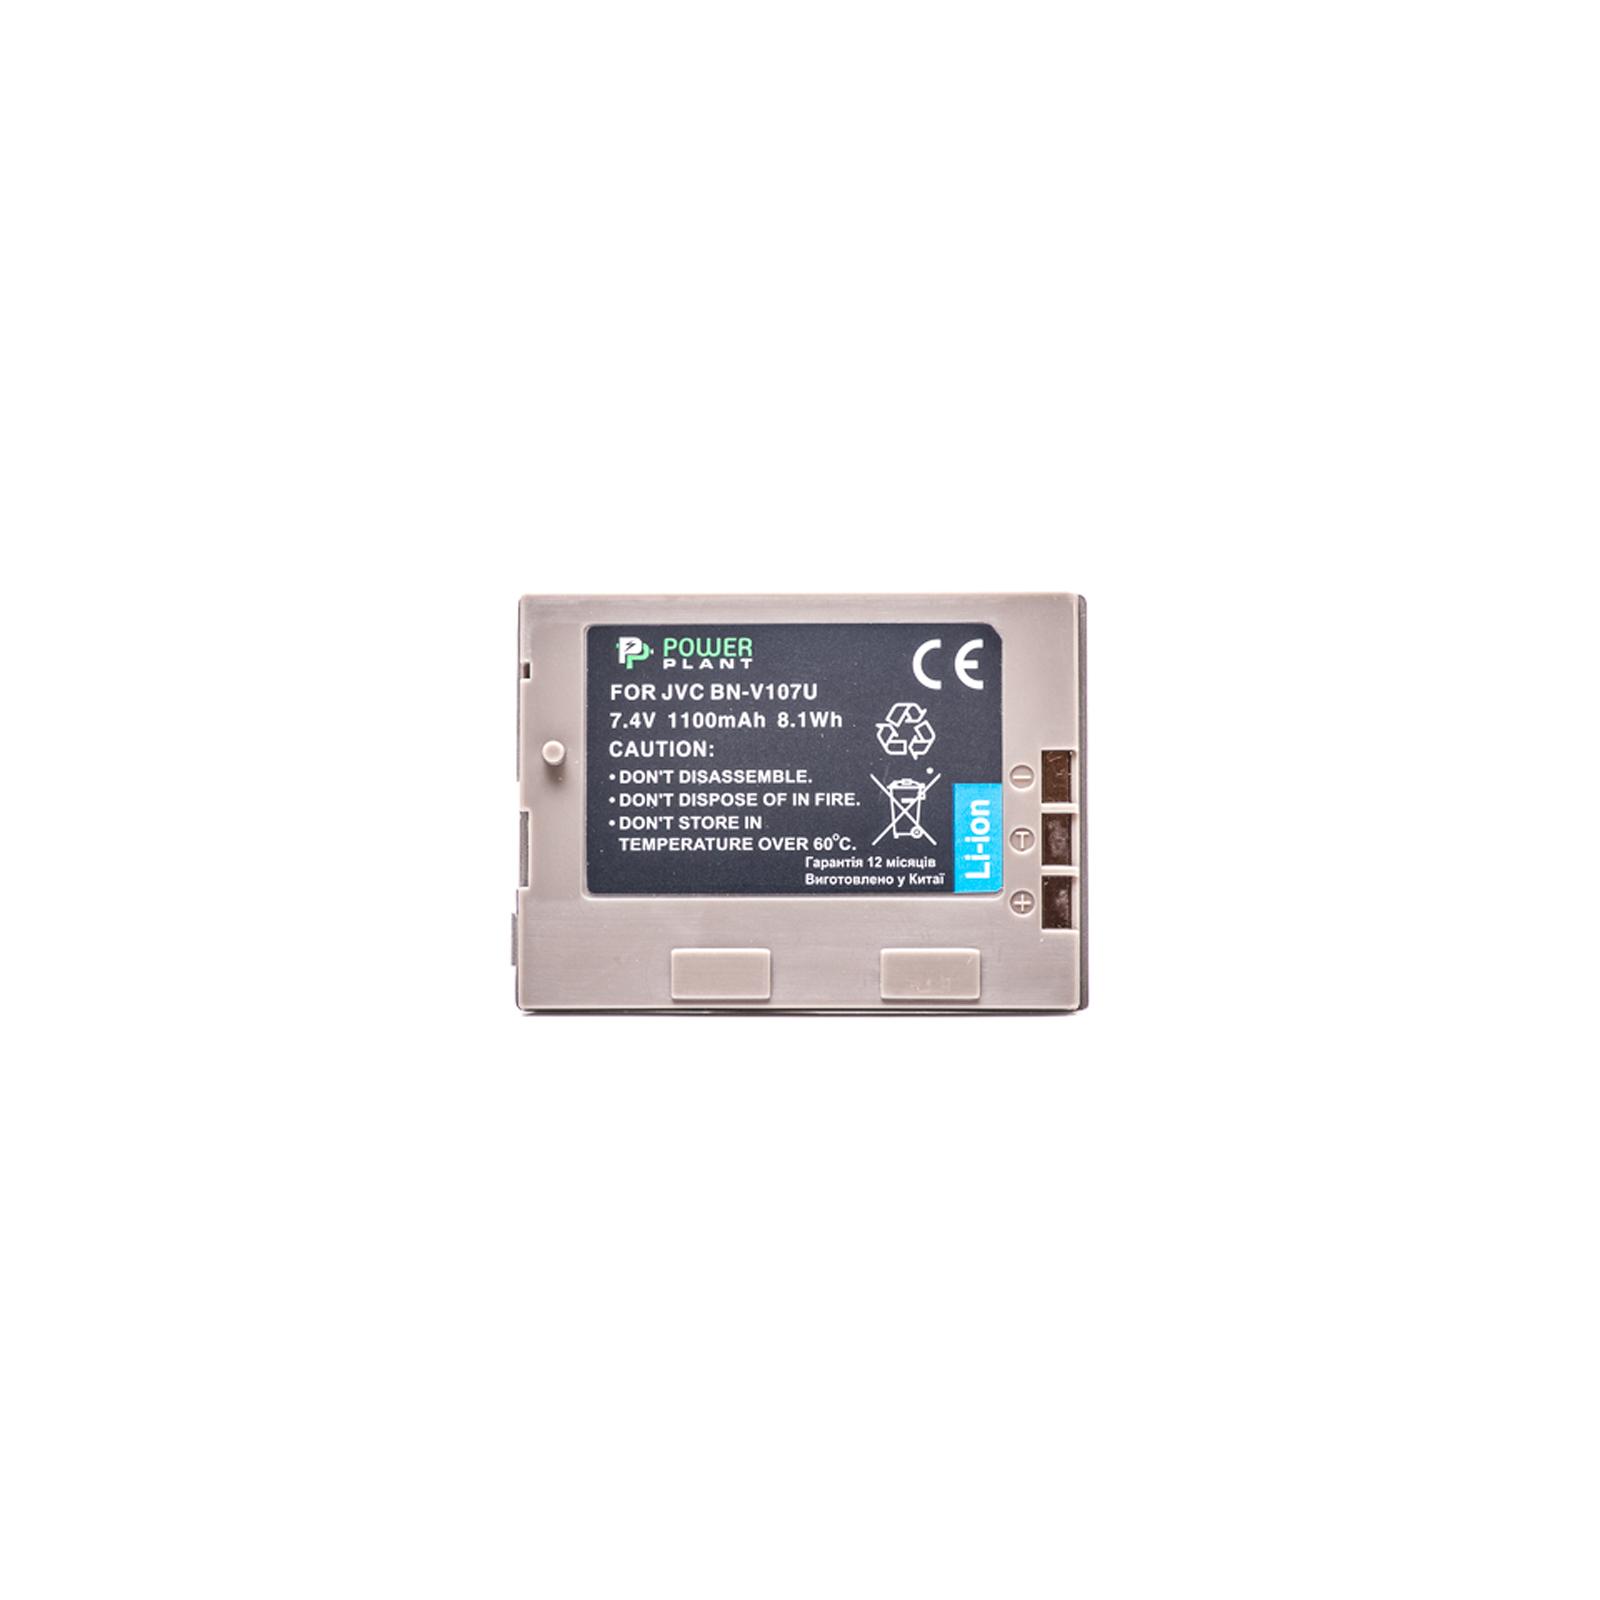 Аккумулятор к фото/видео PowerPlant JVC BN-V107U (DV00DV1185) изображение 2